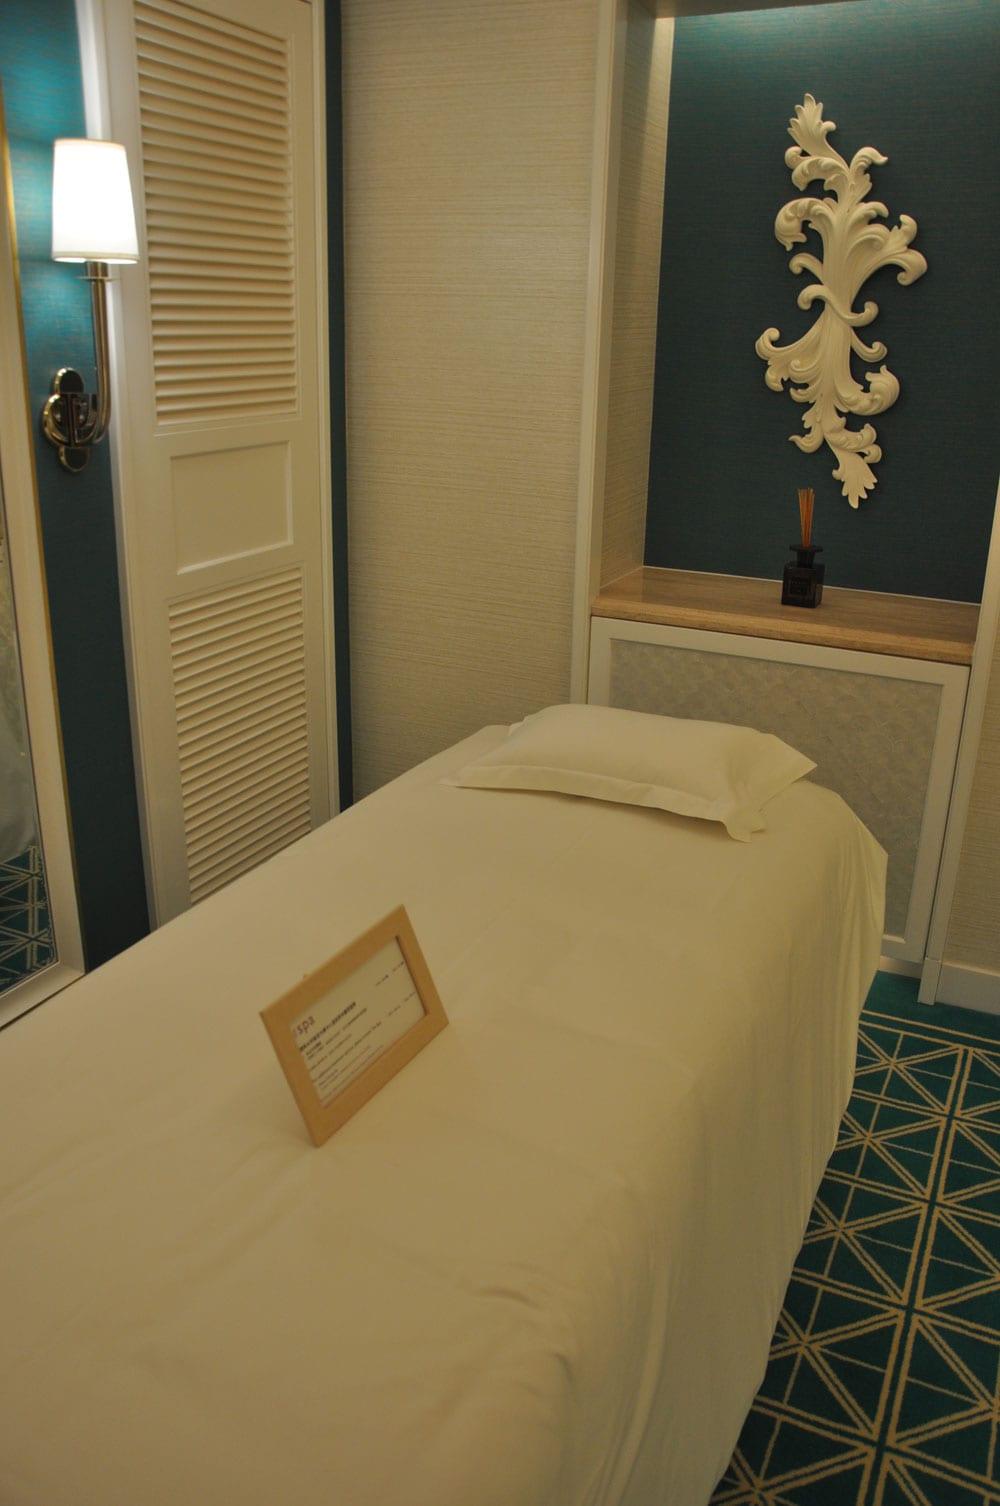 Wynn Palace King Room massage bed